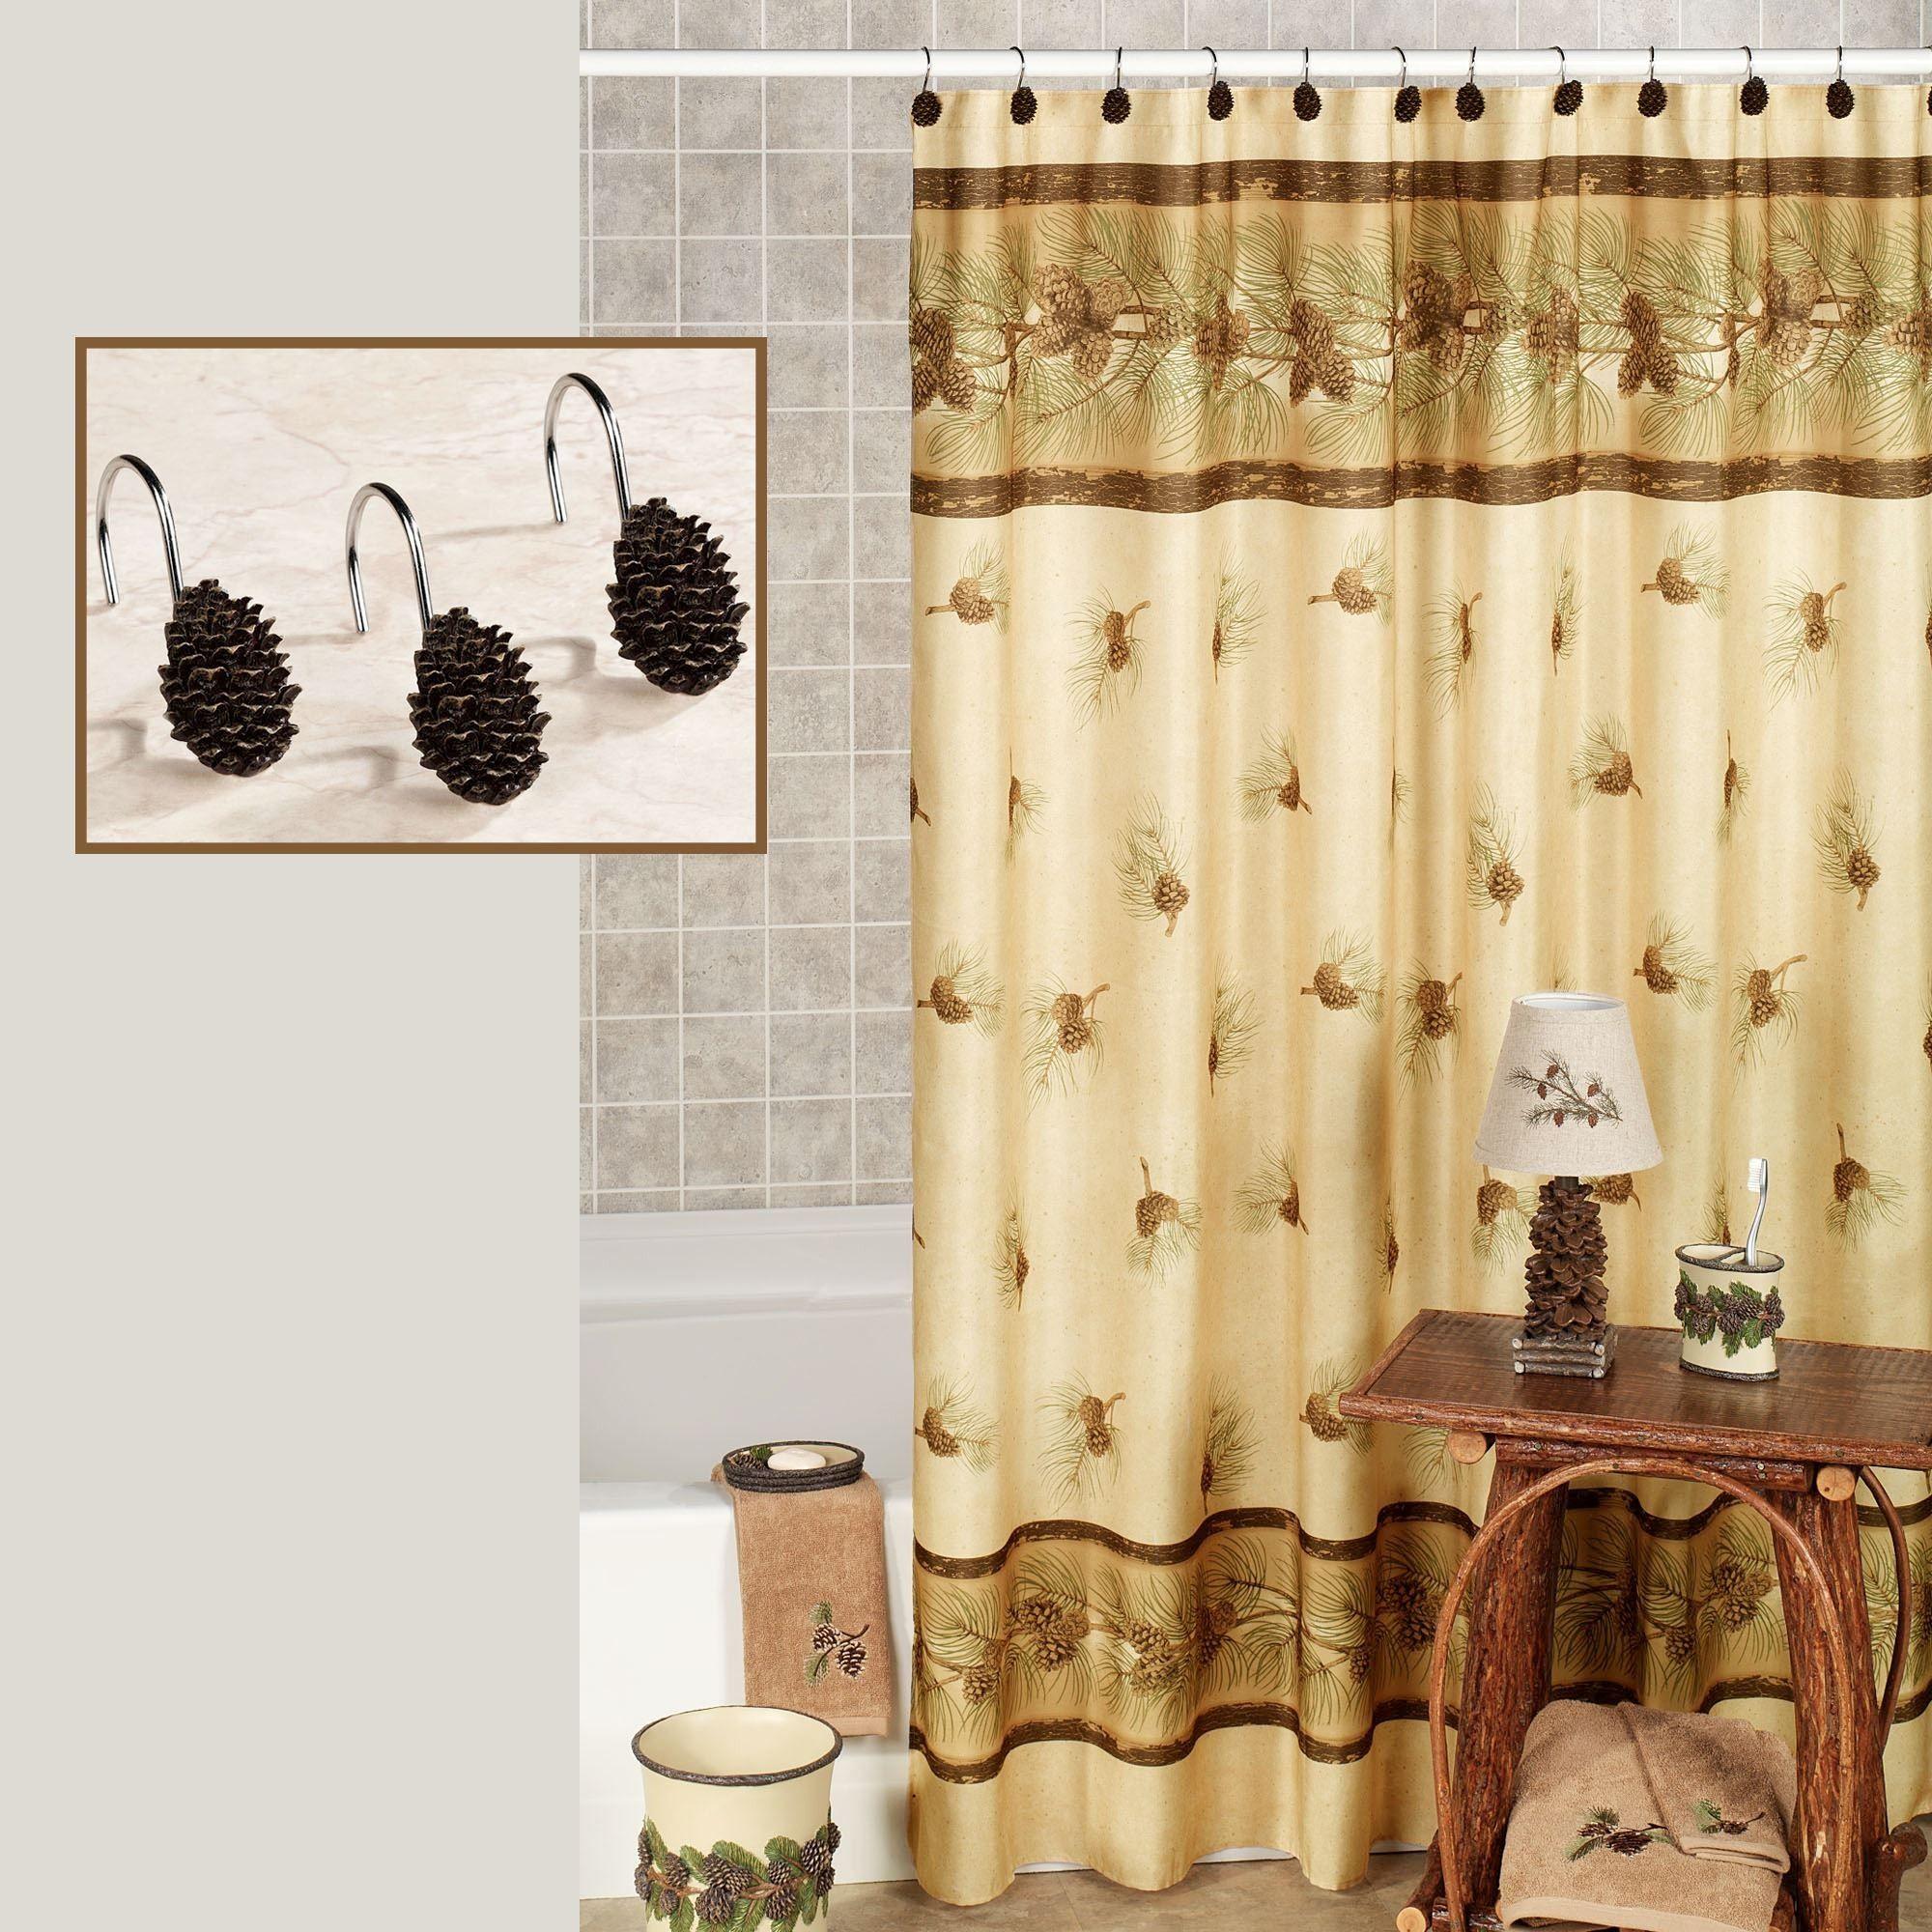 New Moose Lodge Shower Curtain Dengan Gambar